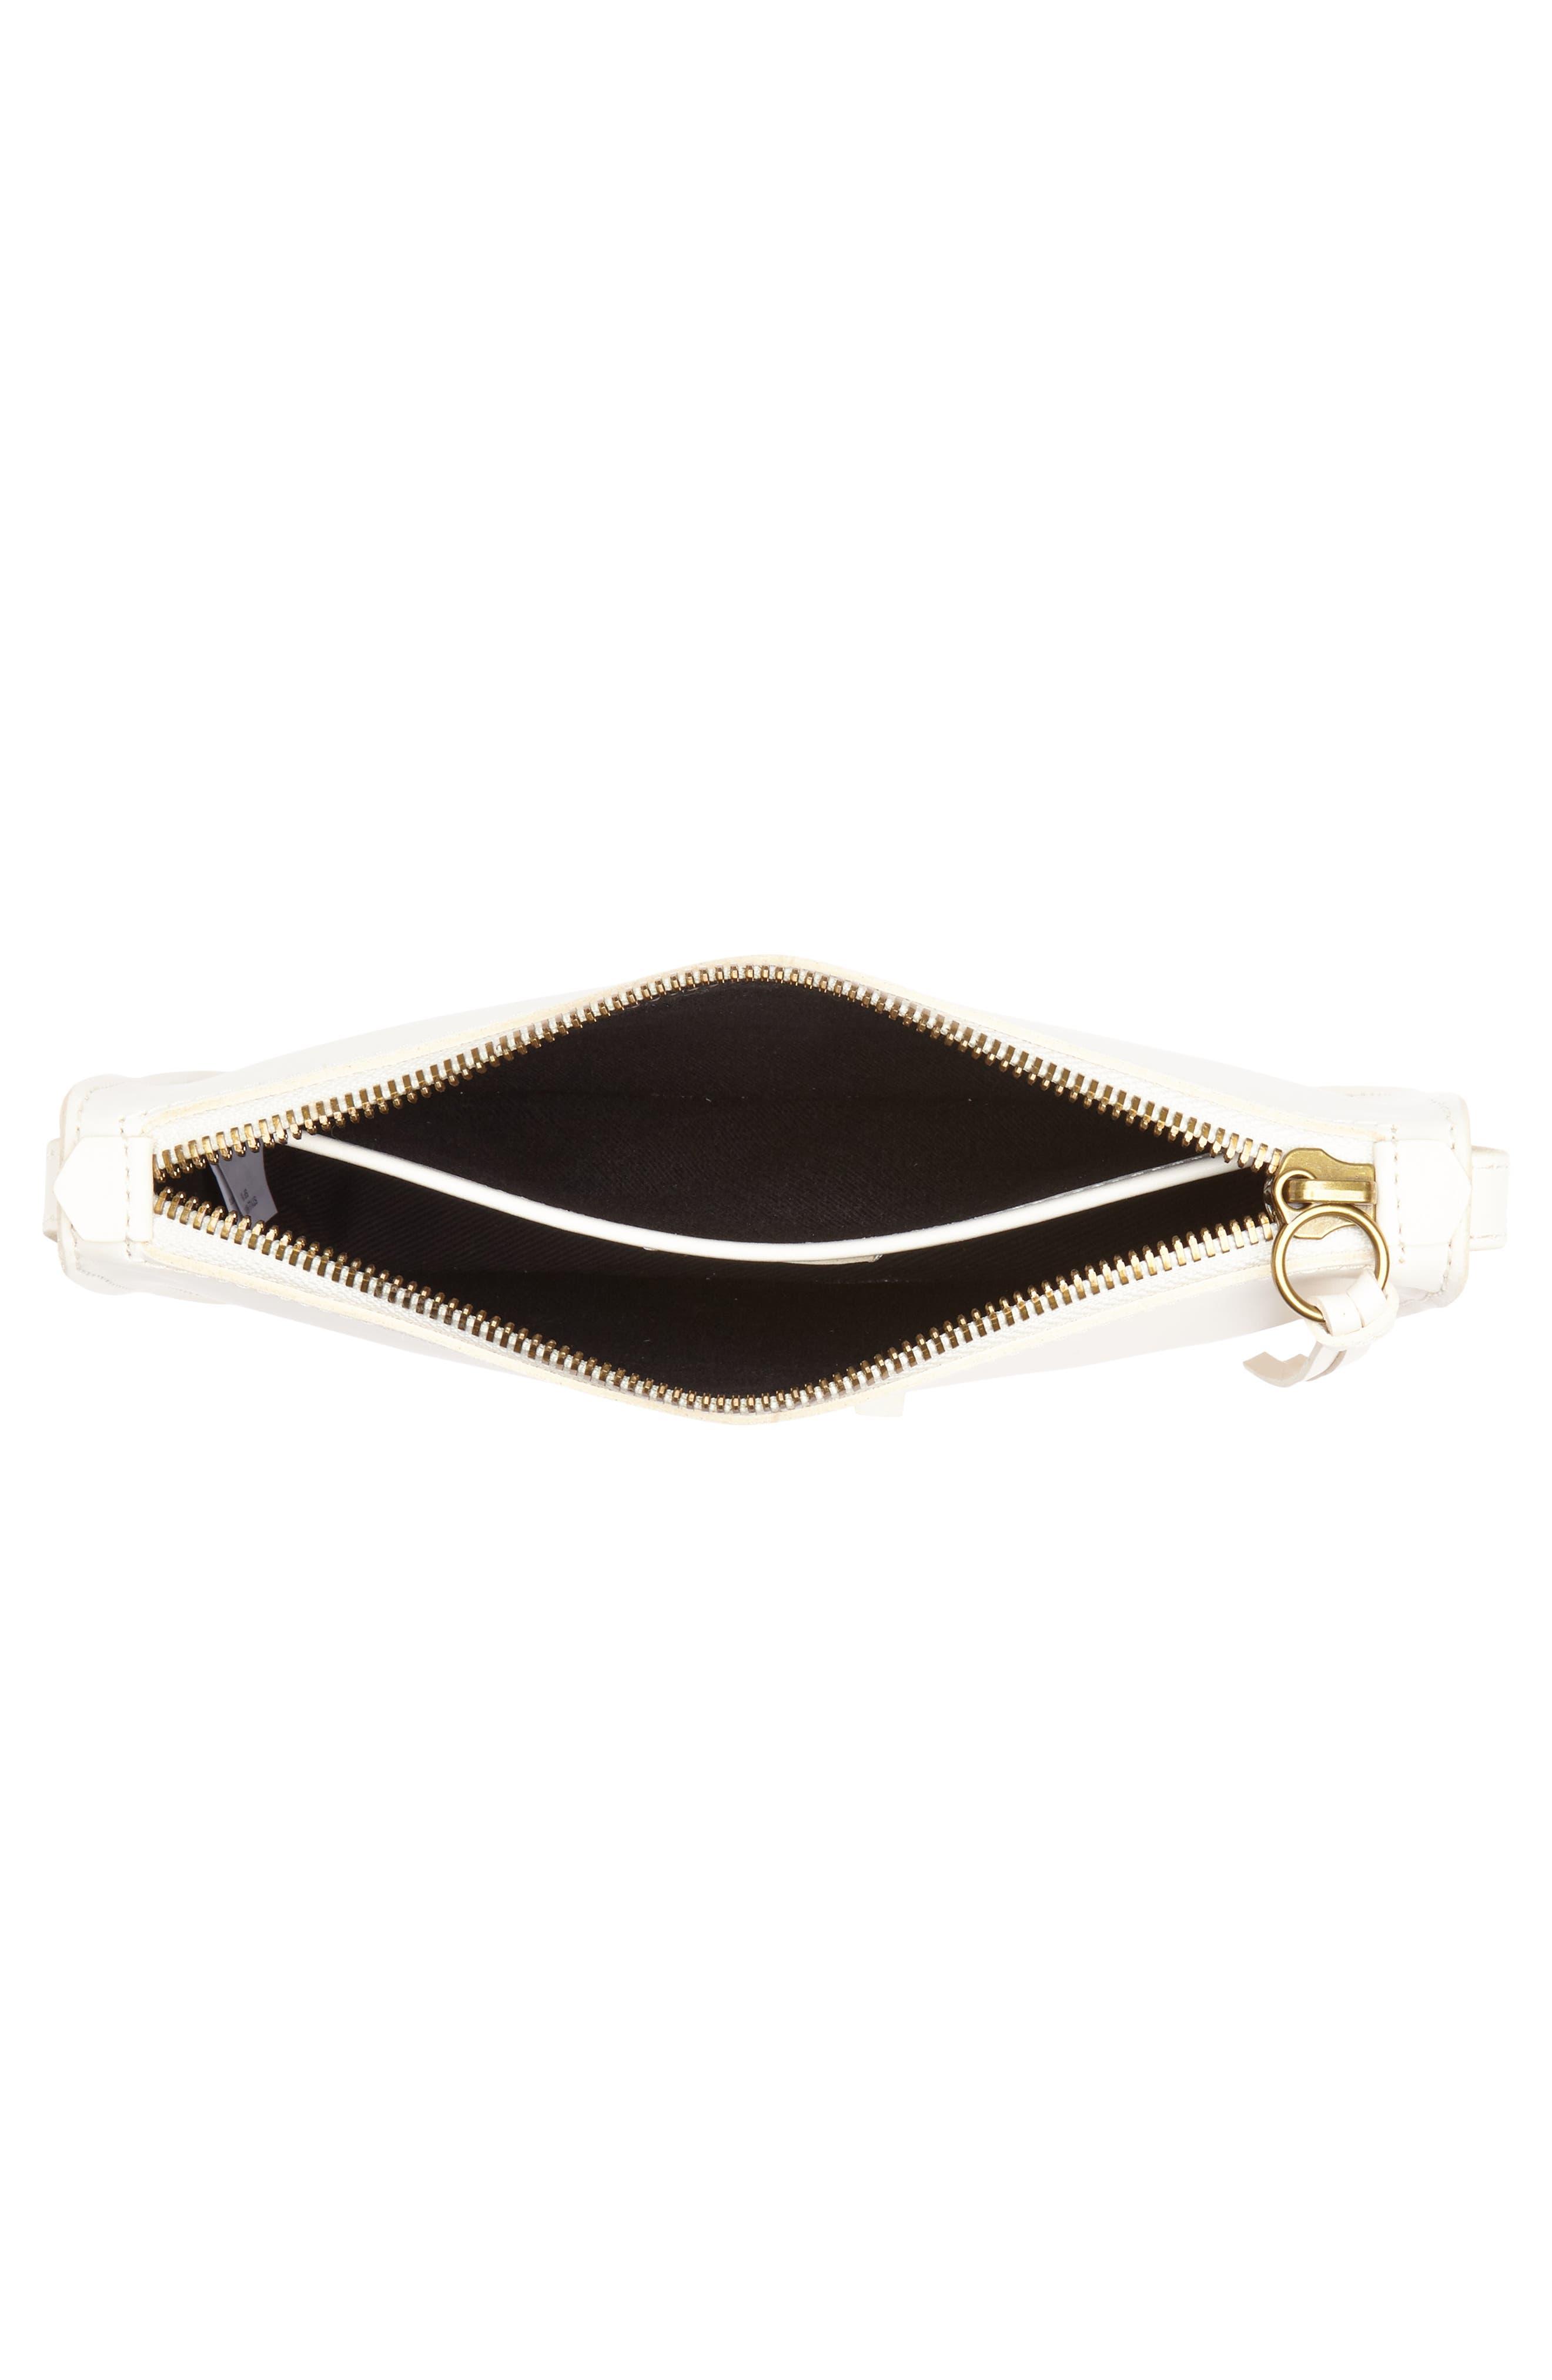 Simple Leather Crossbody Bag,                             Alternate thumbnail 4, color,                             VINTAGE CANVAS